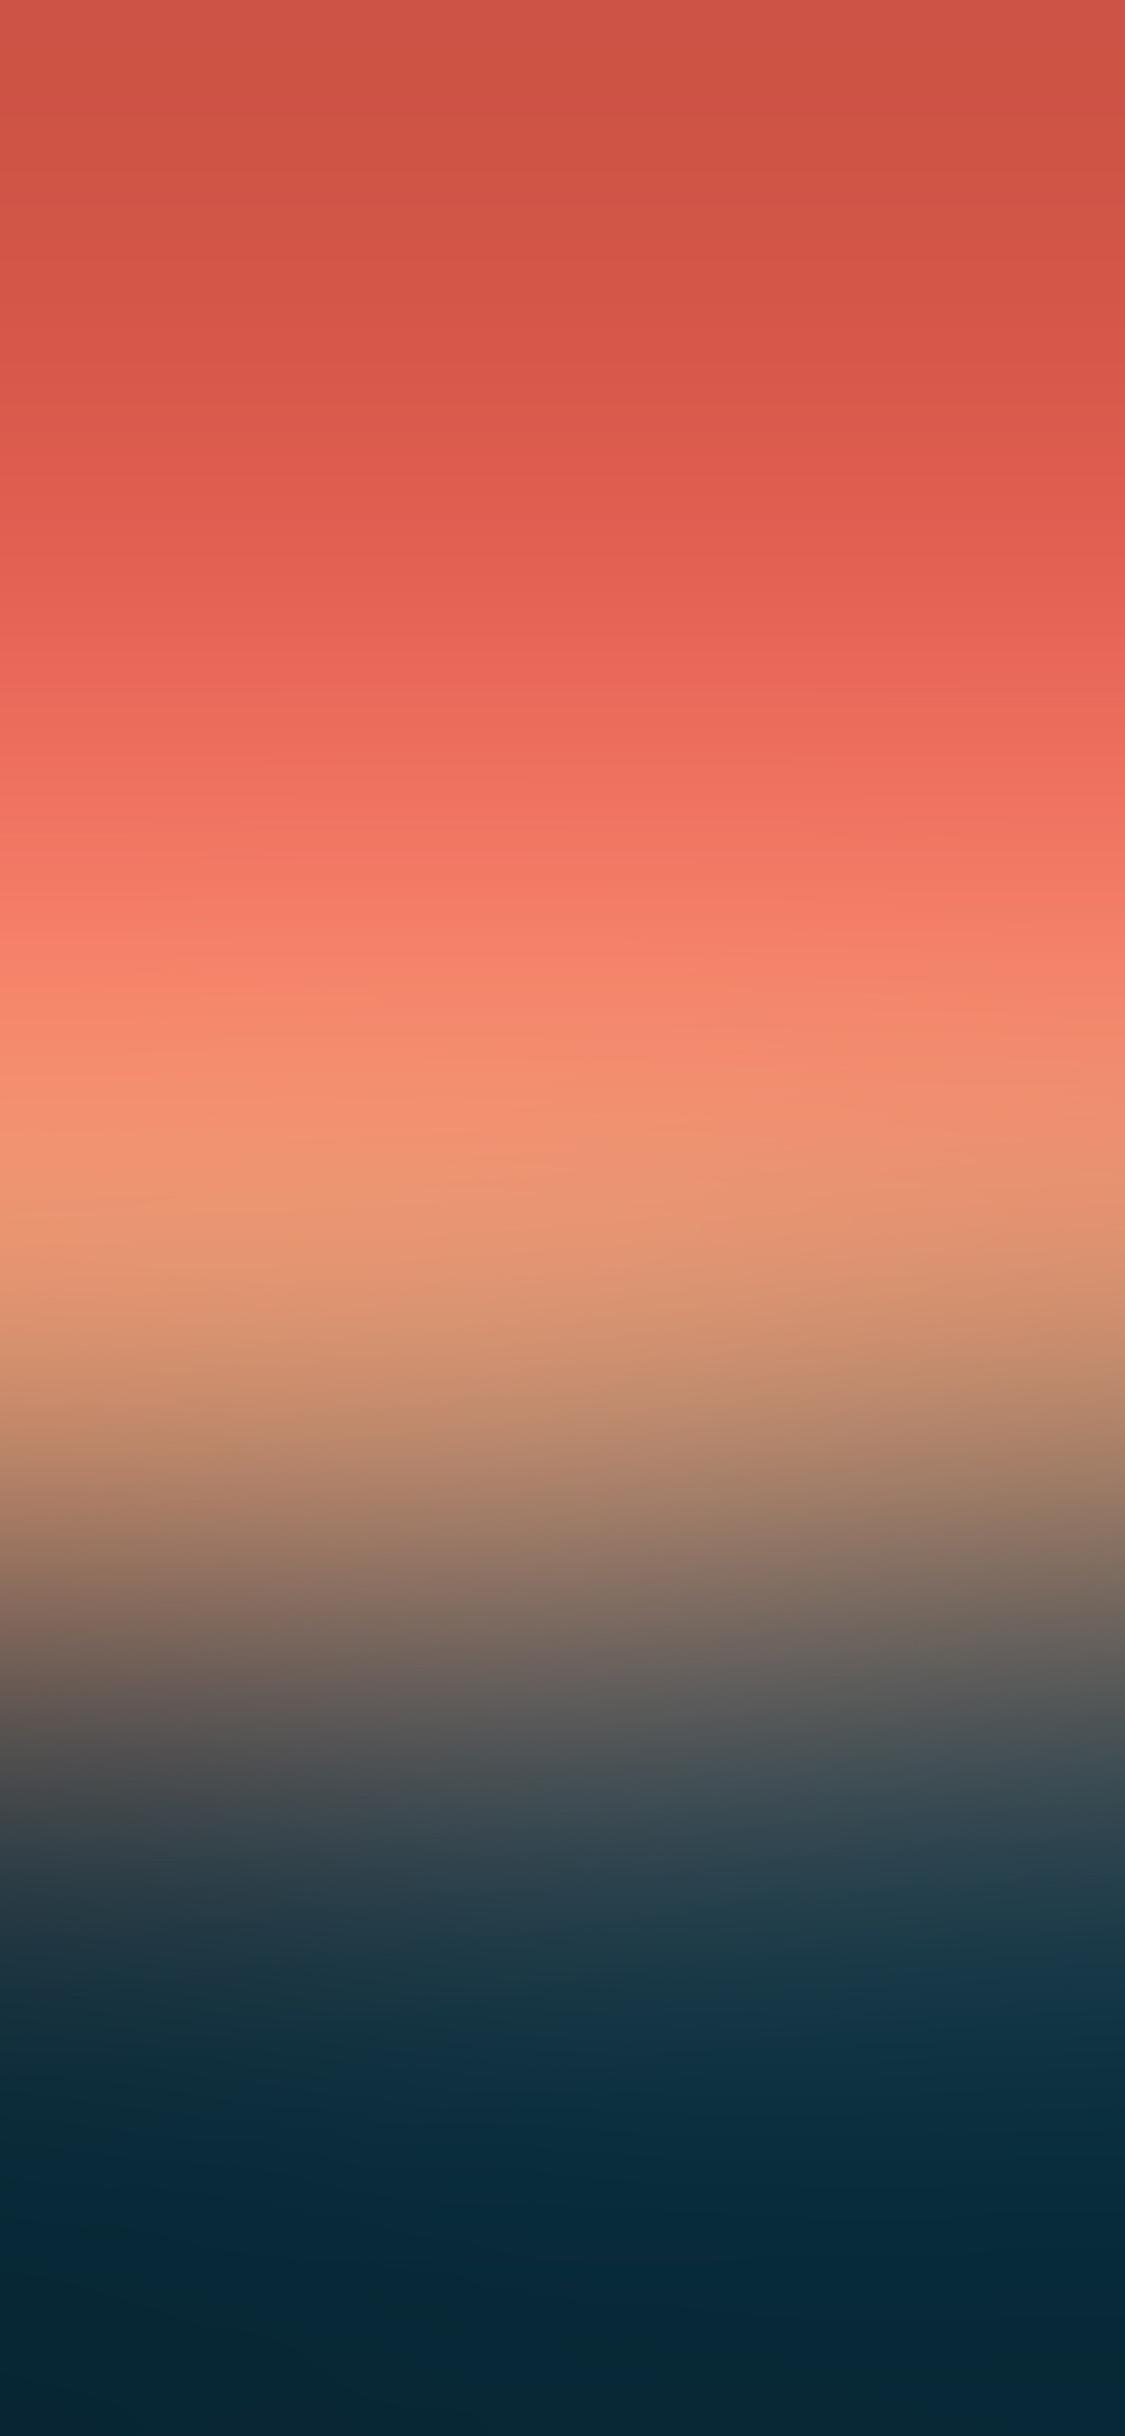 iPhoneXpapers.com-Apple-iPhone-wallpaper-sj10-red-blue-soft-morning-blur